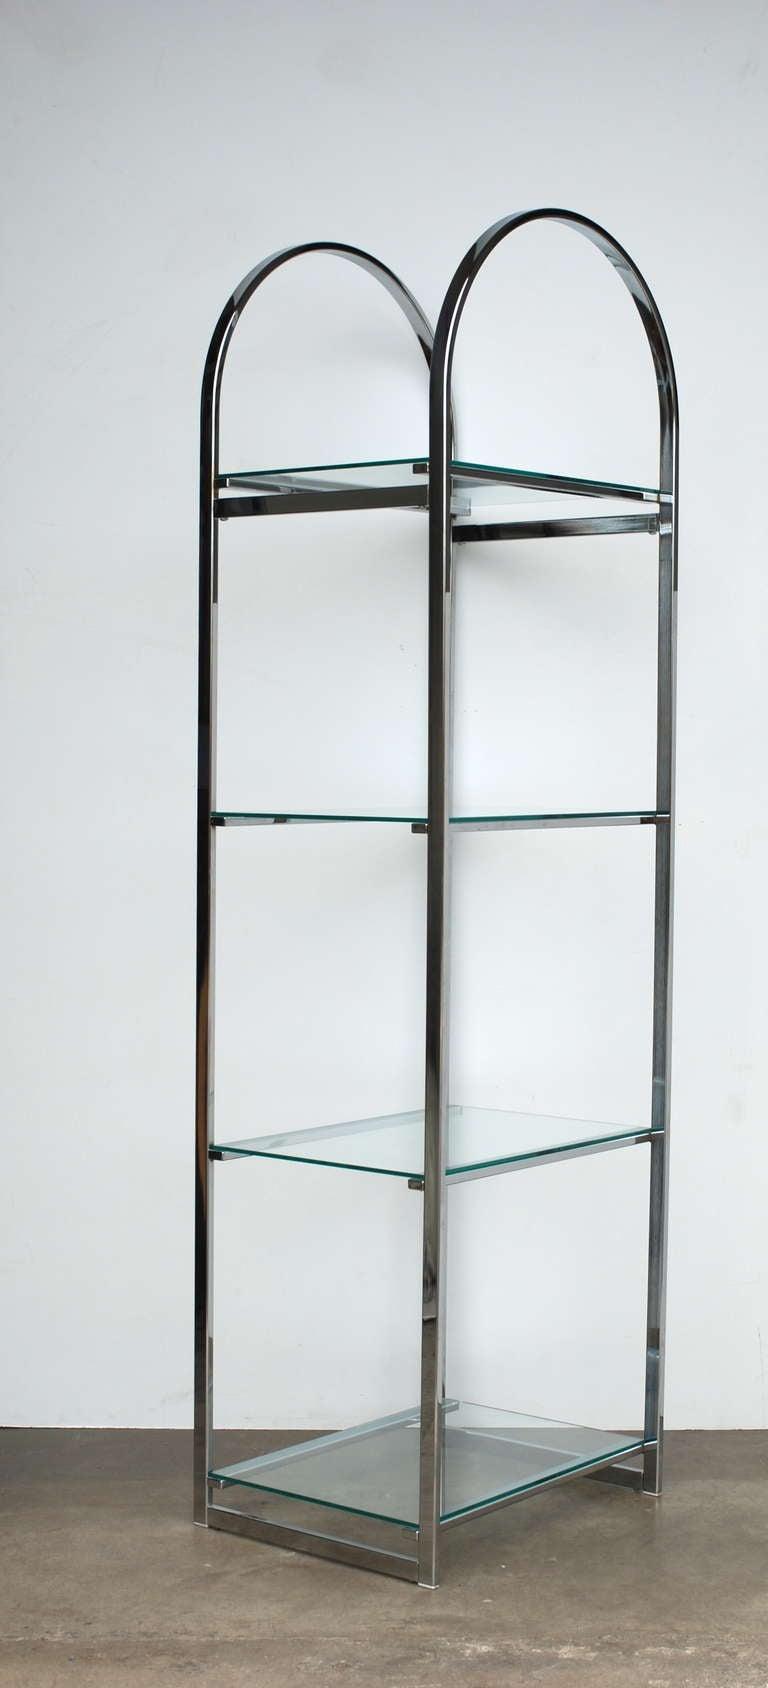 pair of chrome flat bar etageres at 1stdibs. Black Bedroom Furniture Sets. Home Design Ideas